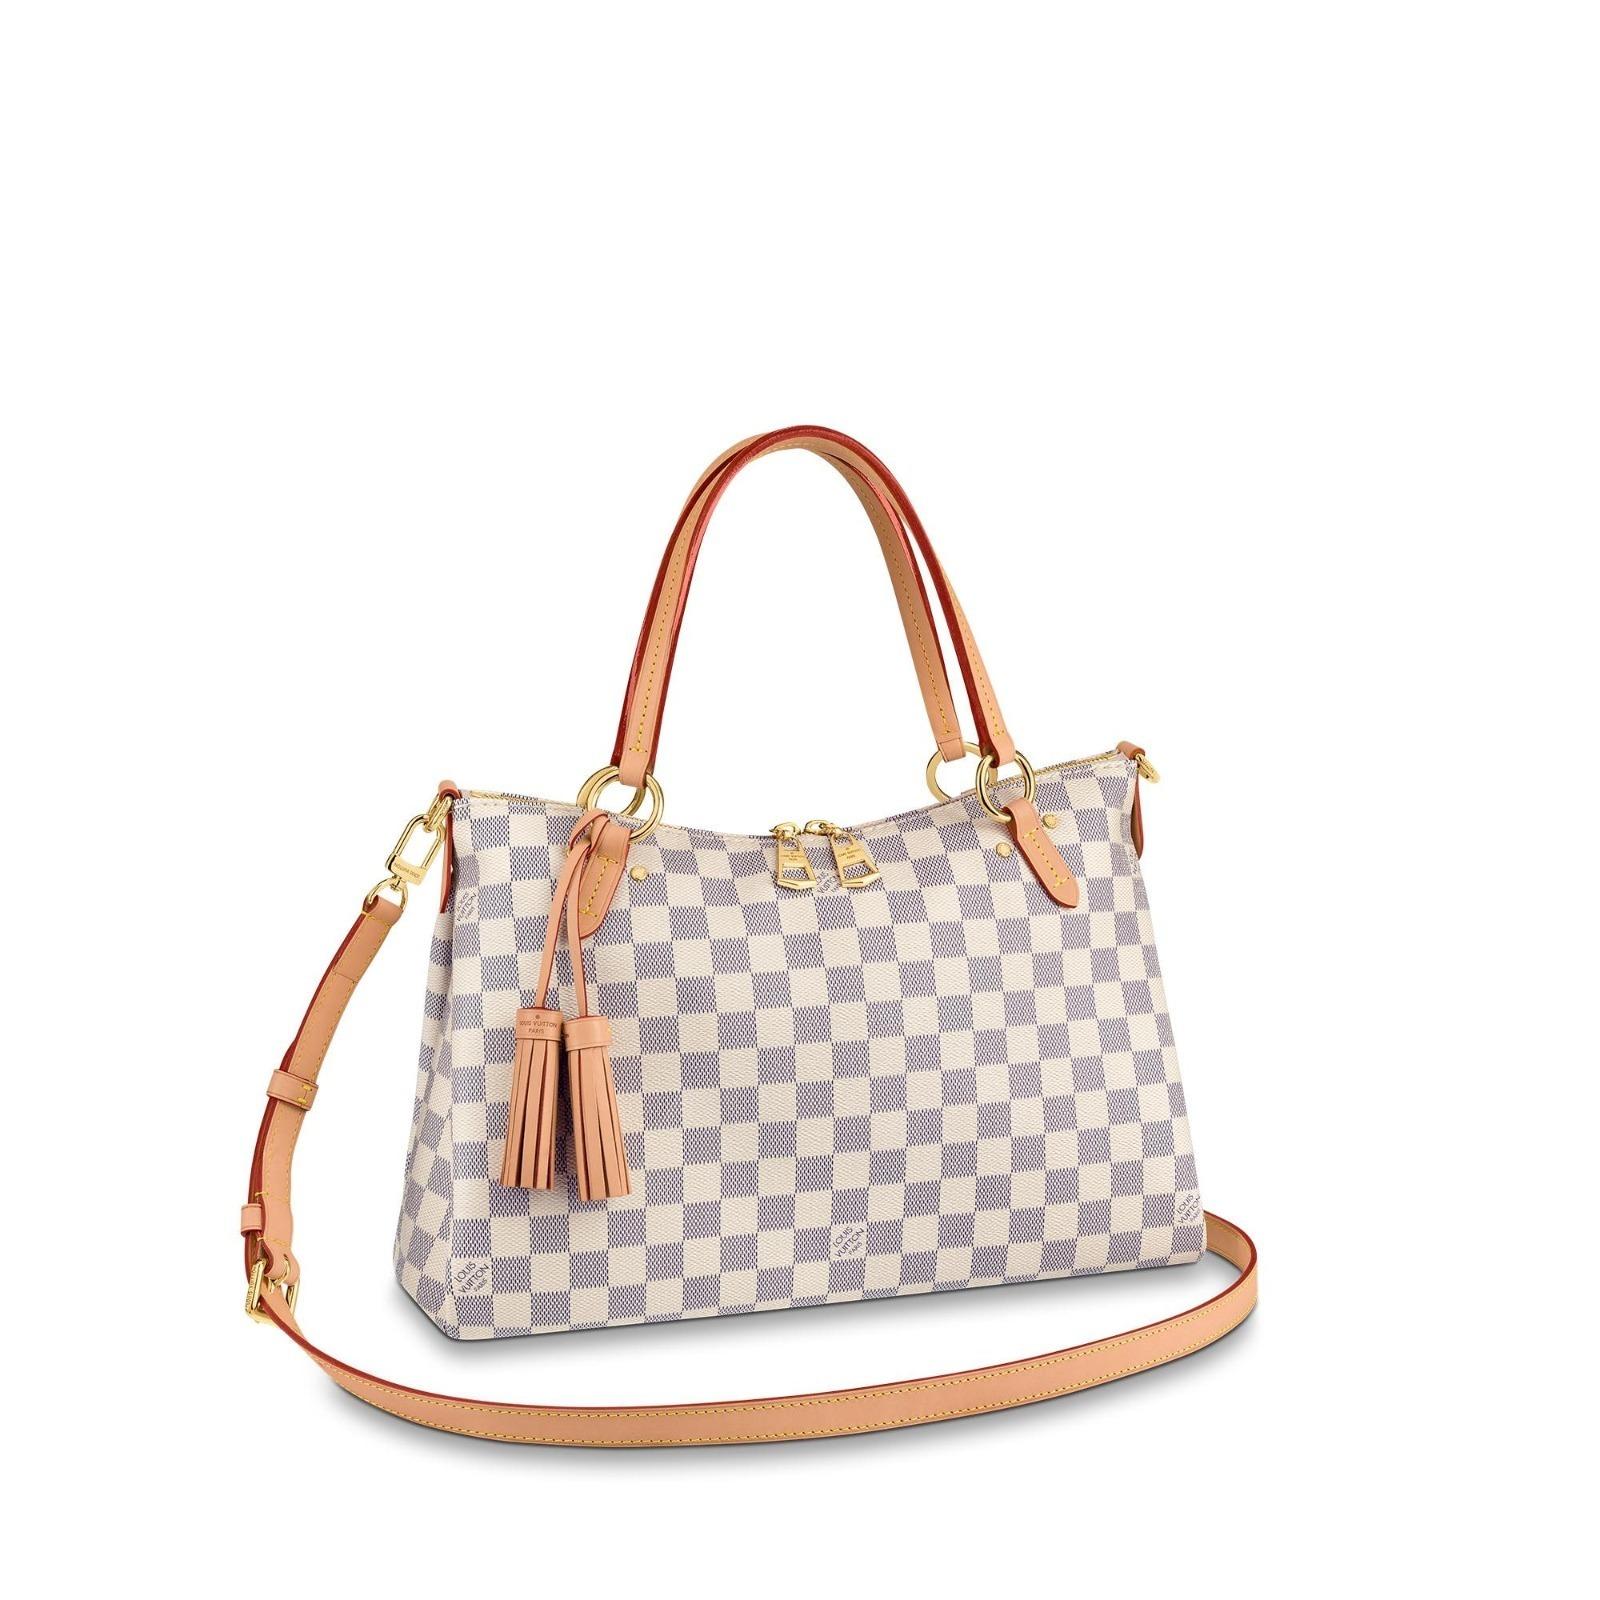 Buy: Lymington Damier Azur Canvas handbag